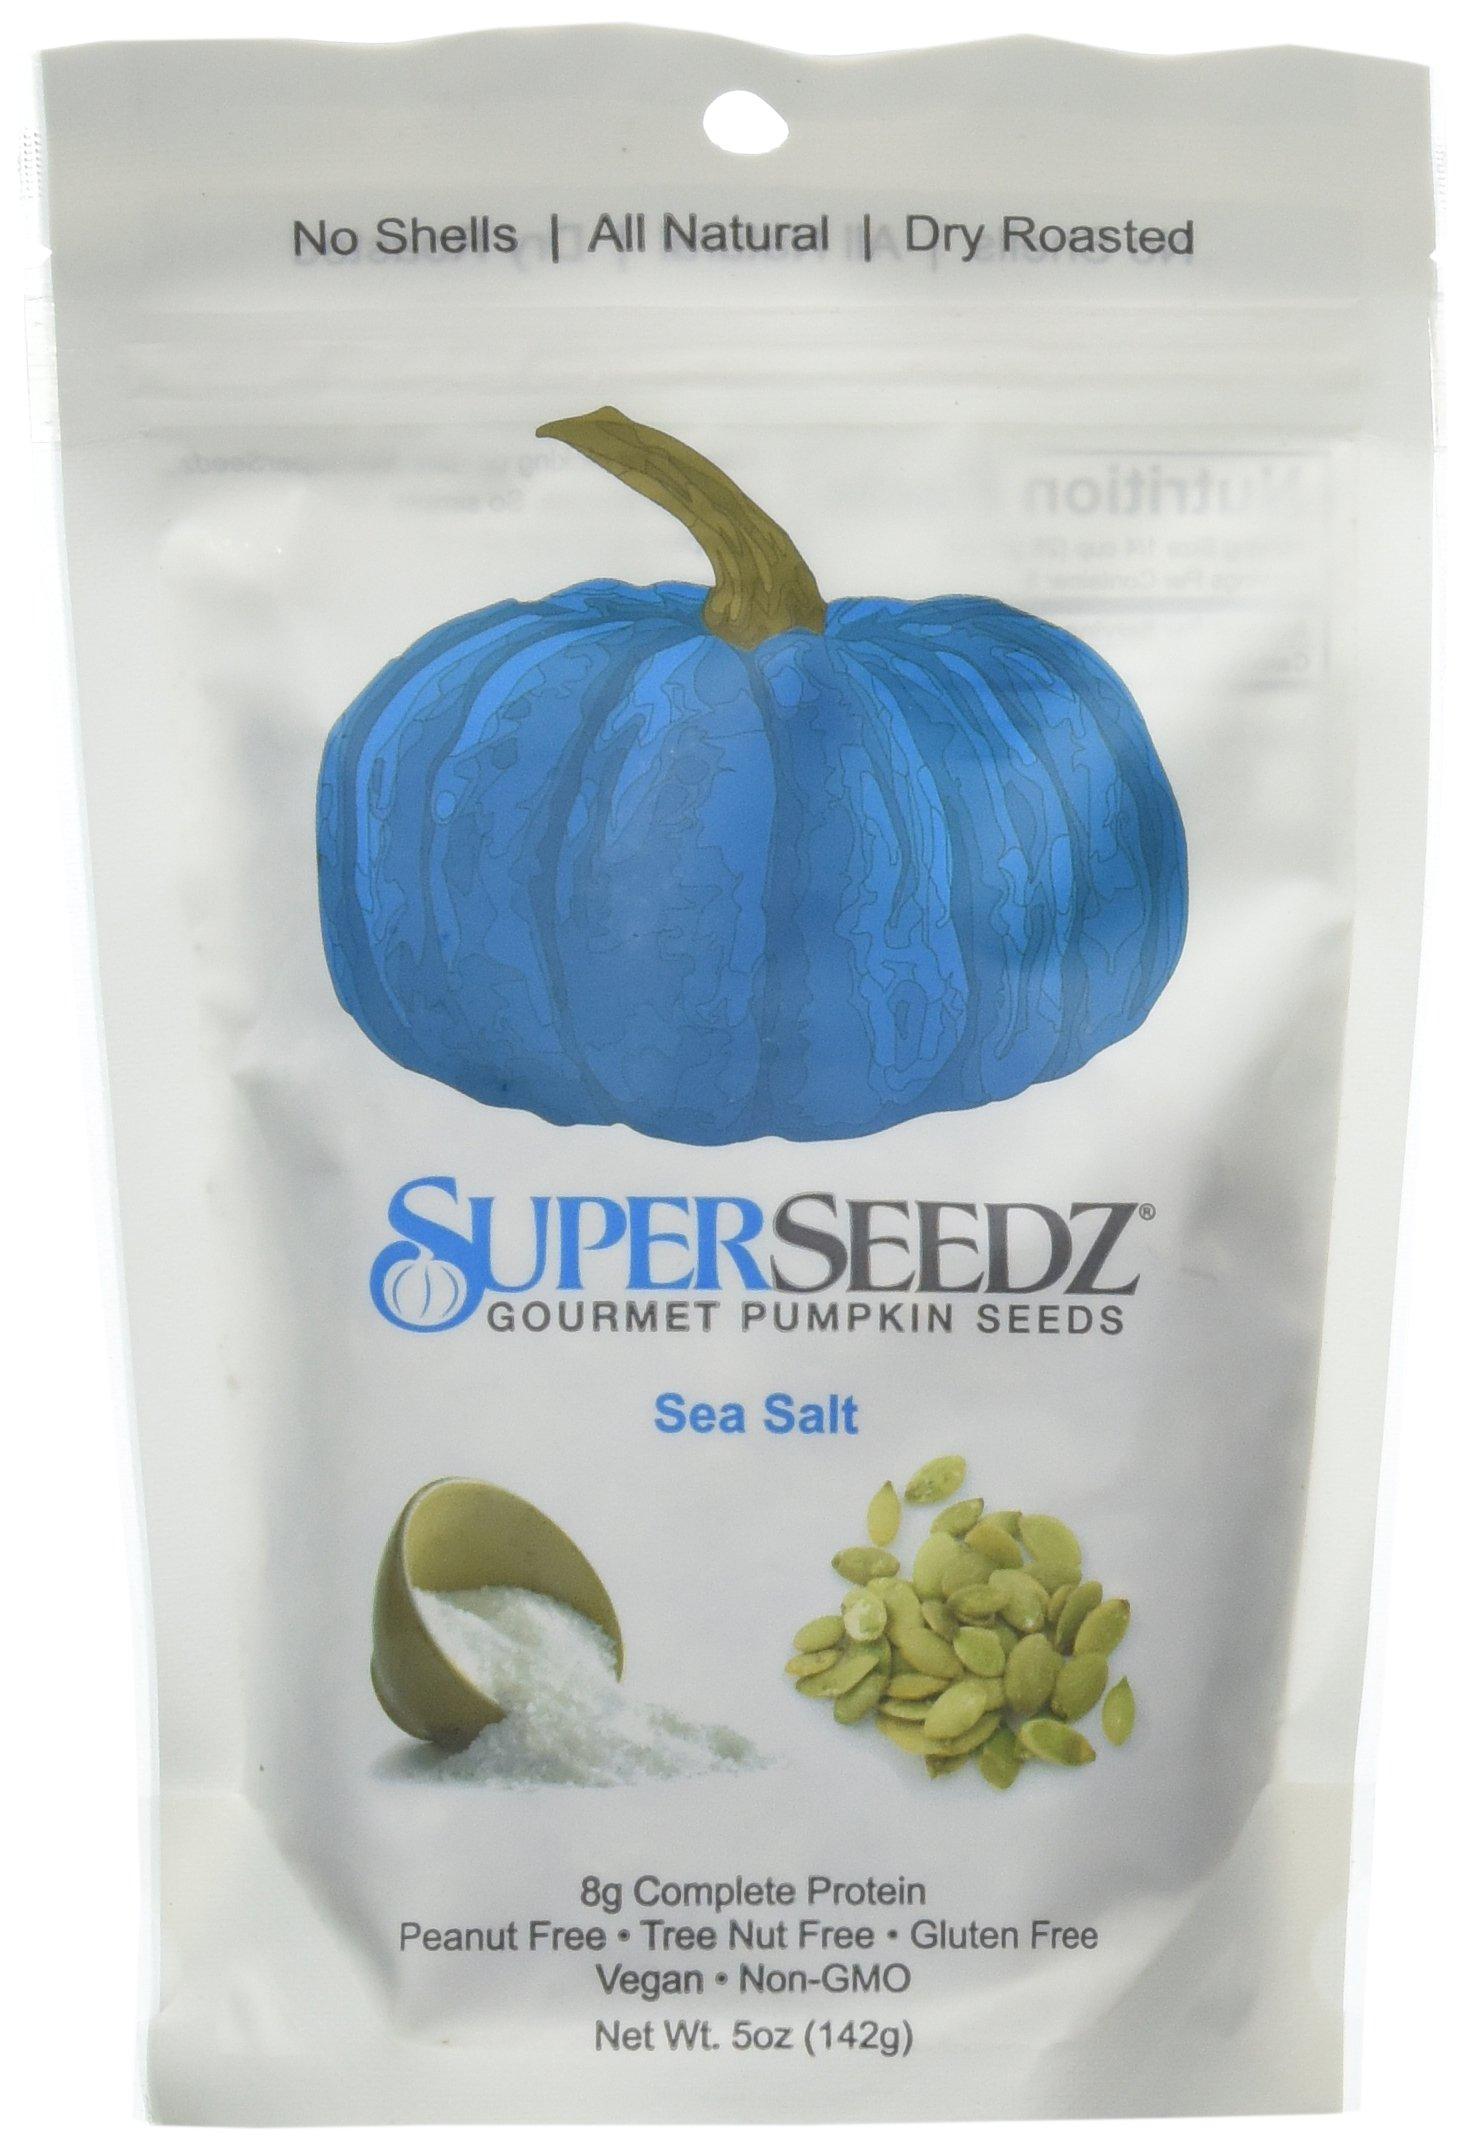 SuperSeedz Sea Salt Pumpkin Seeds Keto Friendly and Paleo Snack - (5oz) 6 pack by SuperSeedz